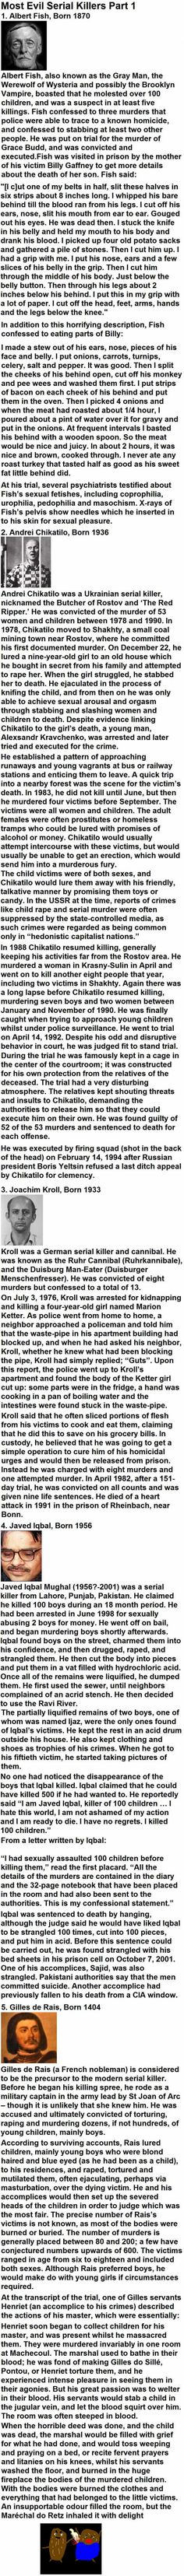 Most Evil Serial Killers Part 1